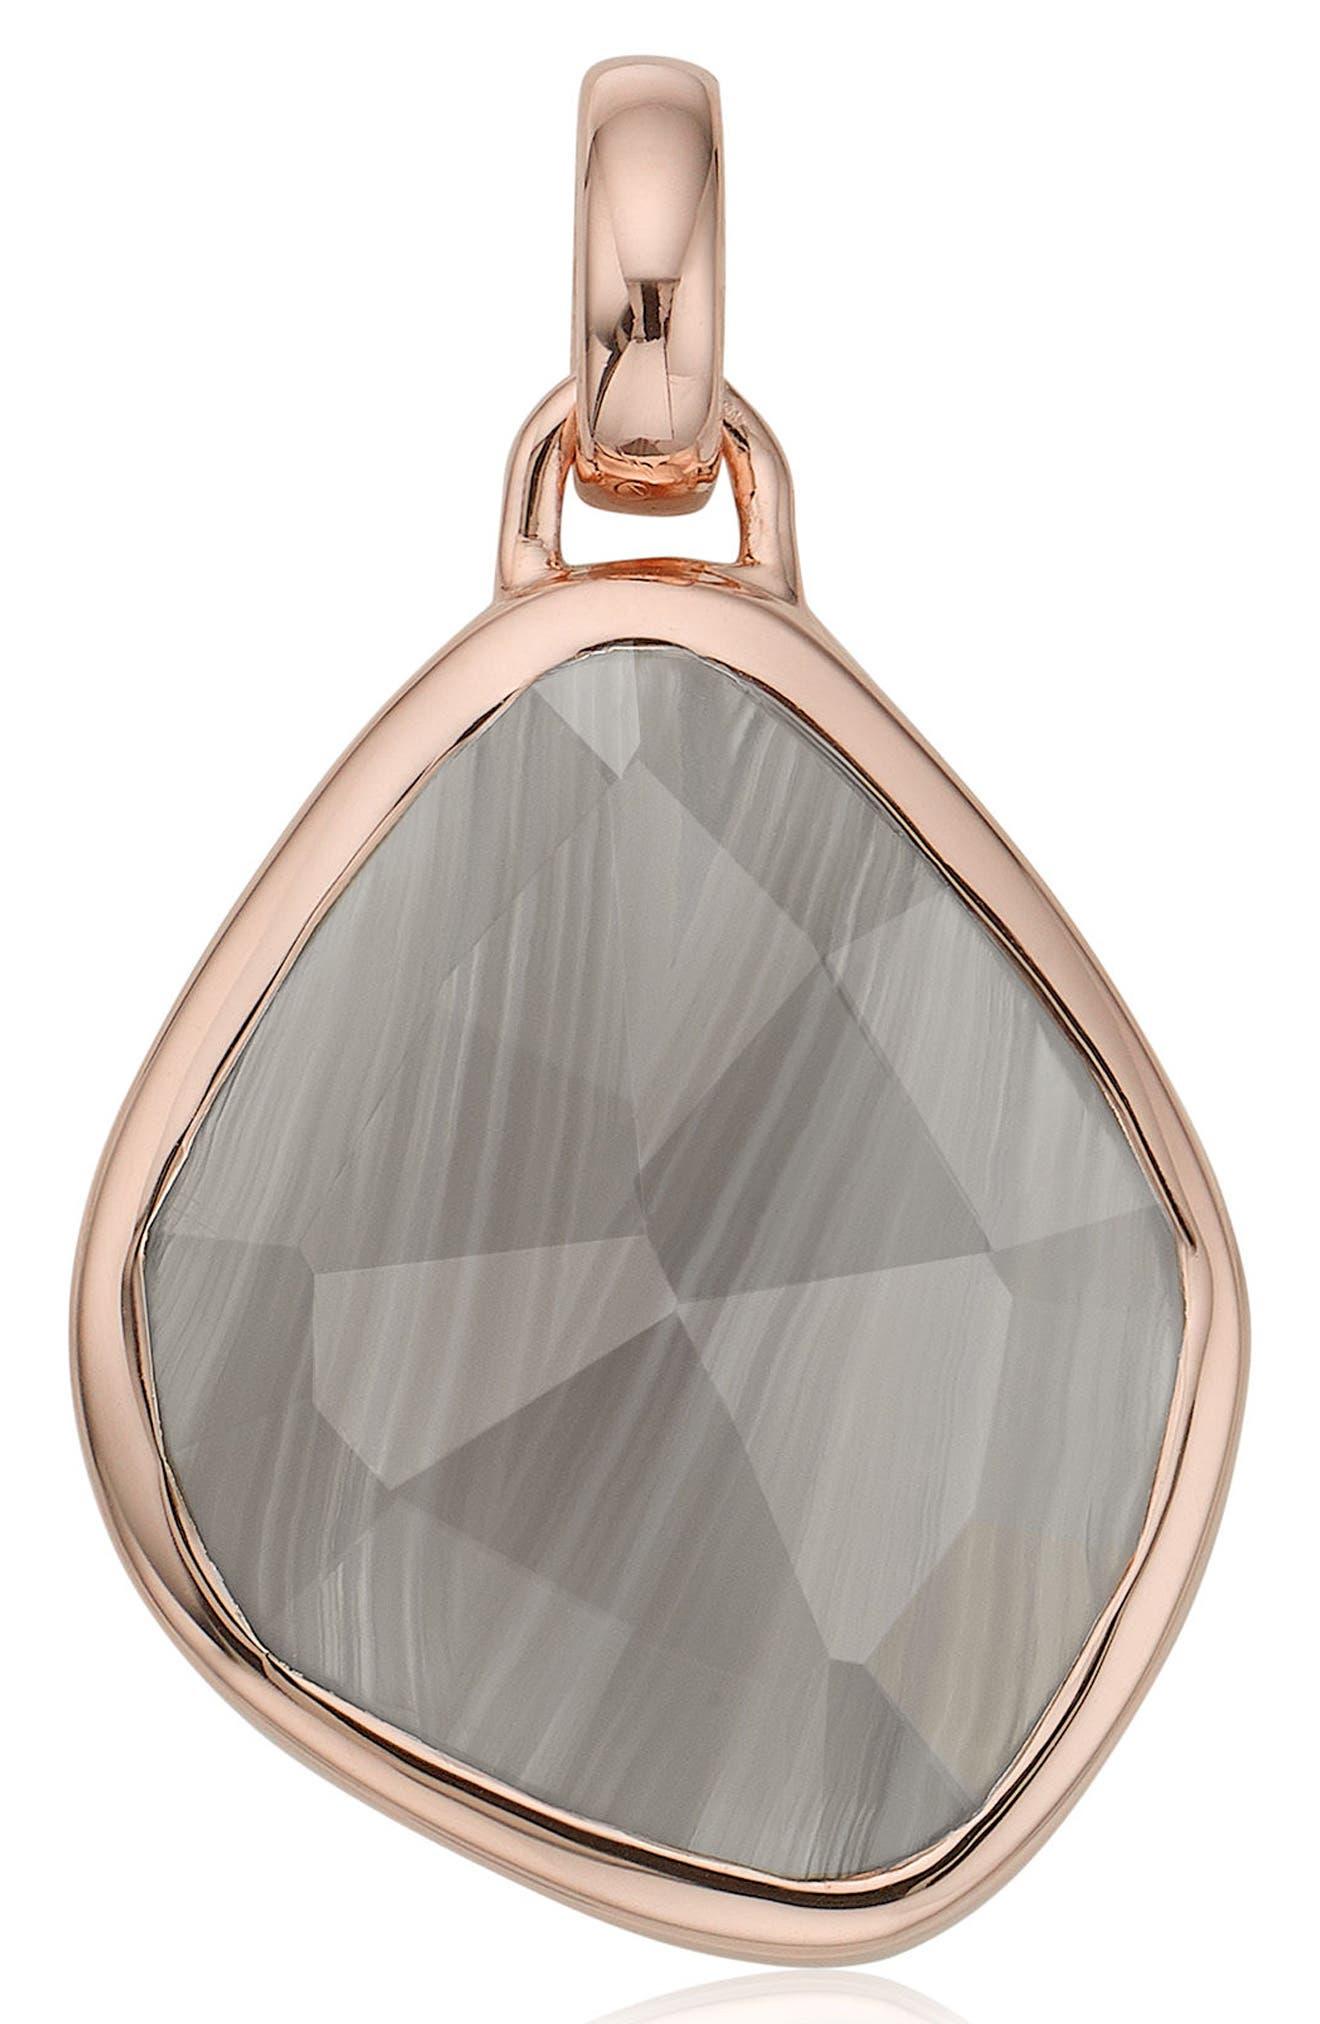 Siren Nugget Semiprecious Stone Pendant,                             Main thumbnail 1, color,                             Grey Agate/ Rose Gold